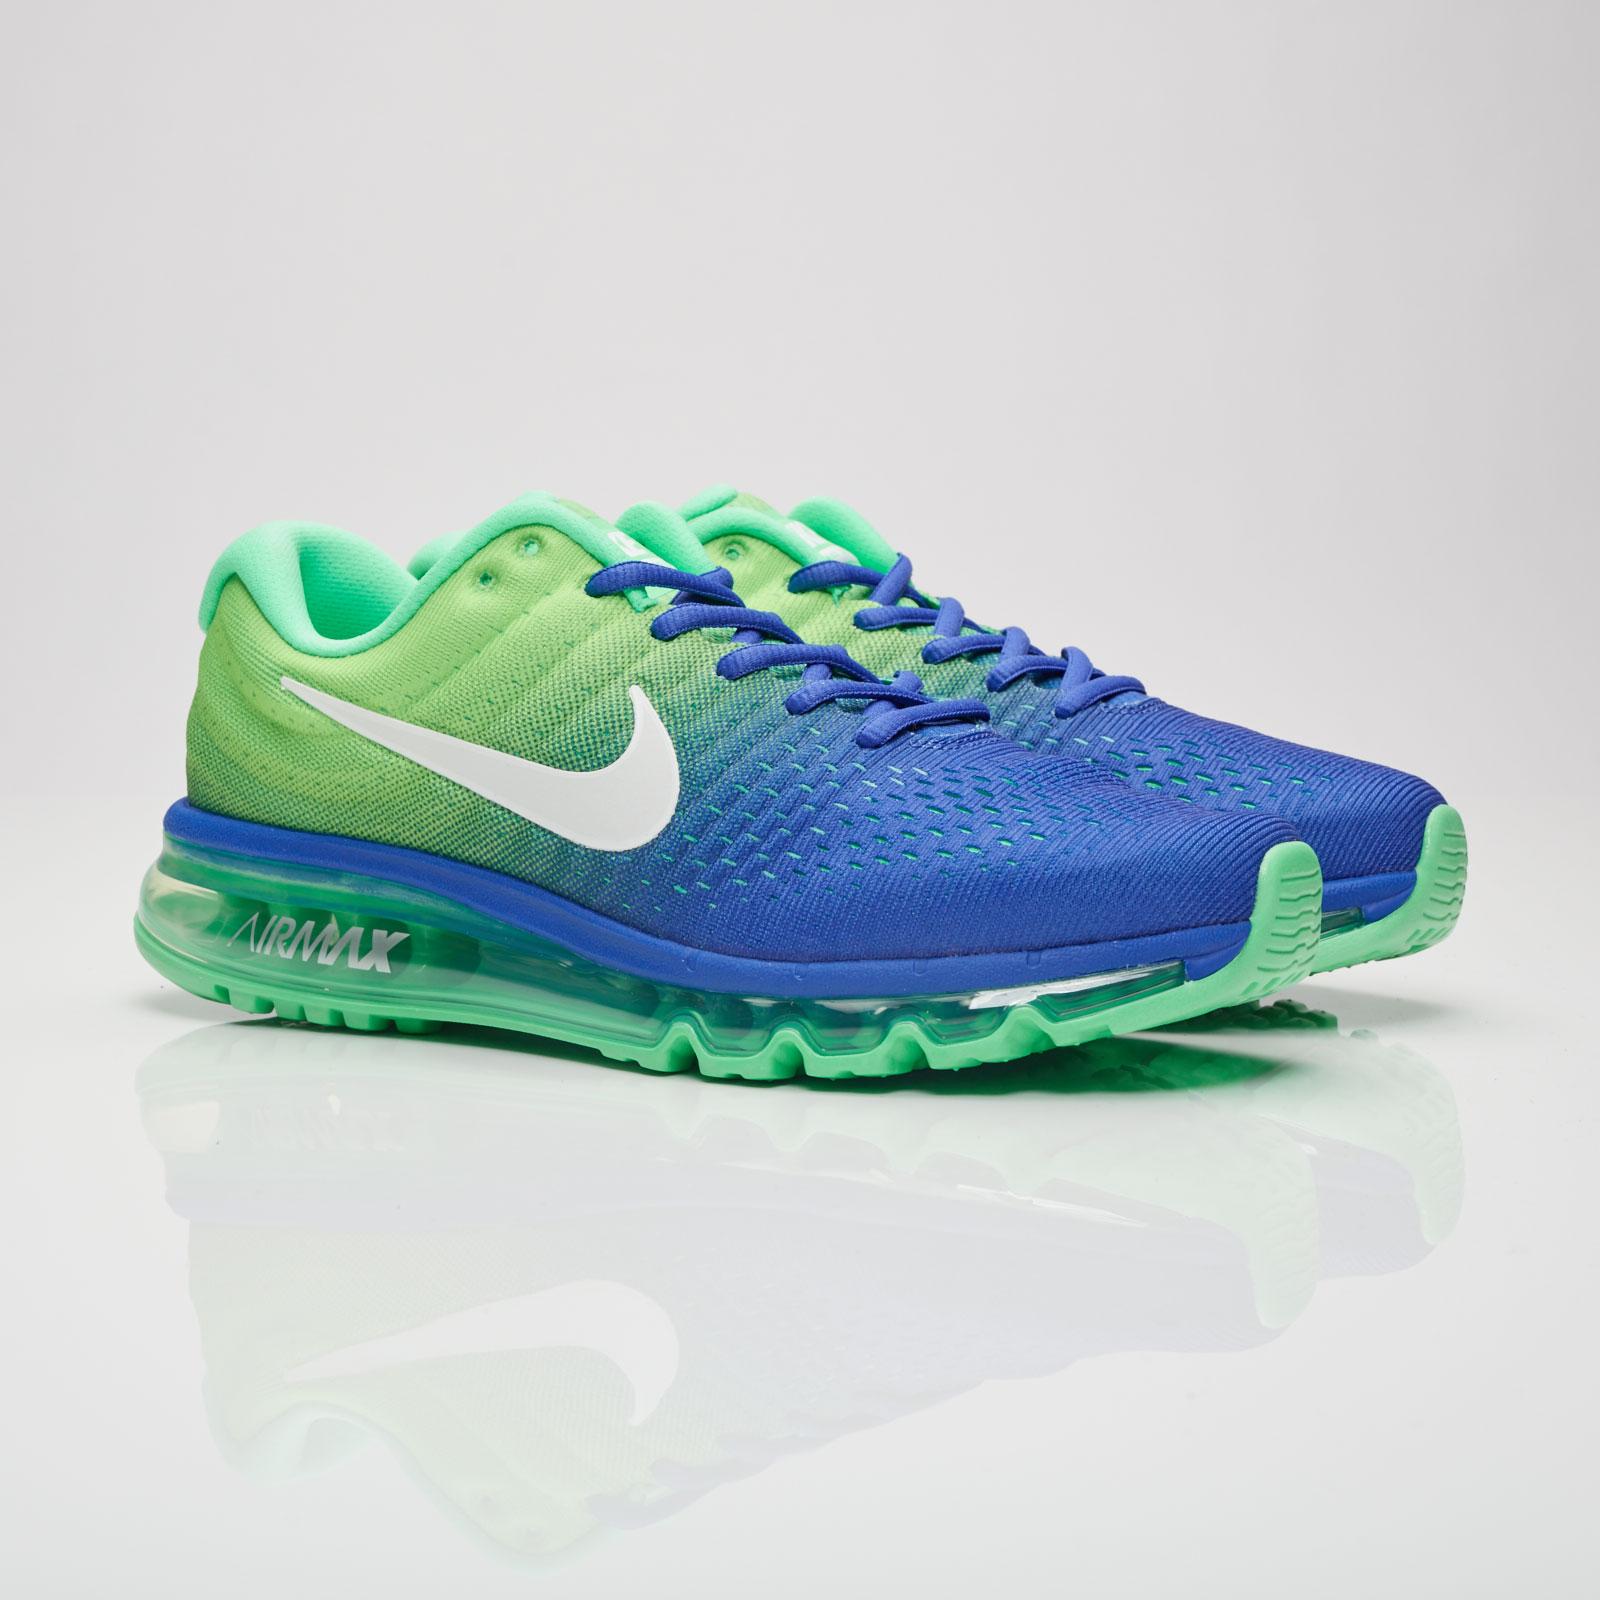 online retailer 6667d b4330 Nike Air Max 2017 - 849559-403 - Sneakersnstuff | sneakers ...